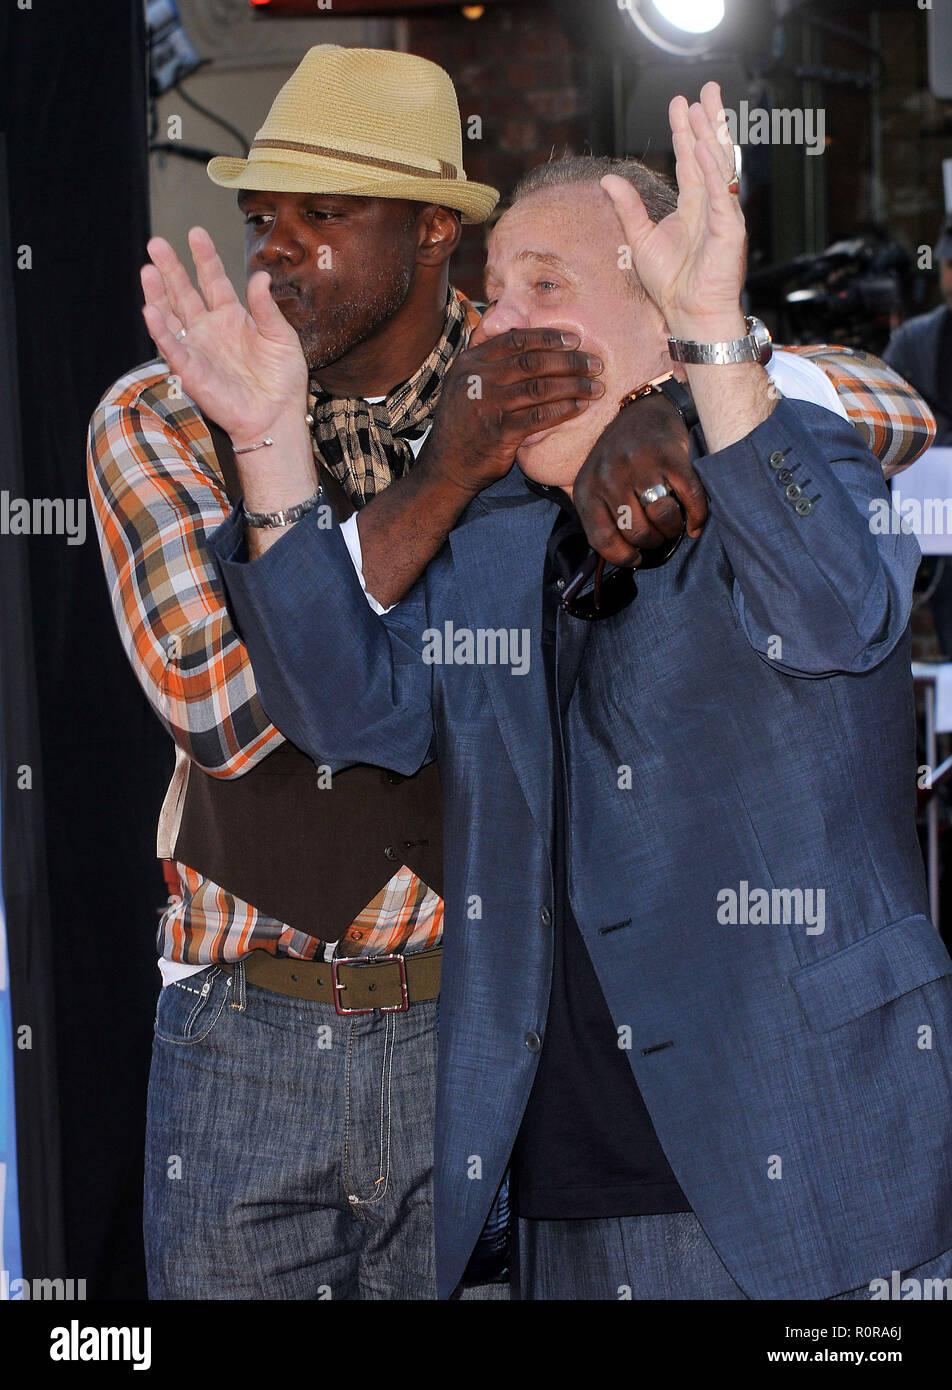 Bolger John Michael and Bentt Michael - Los Angeles Film Festival Public Enemies Premiere at the Westwood Village Theatre In Los Angeles.          -   - Stock Image